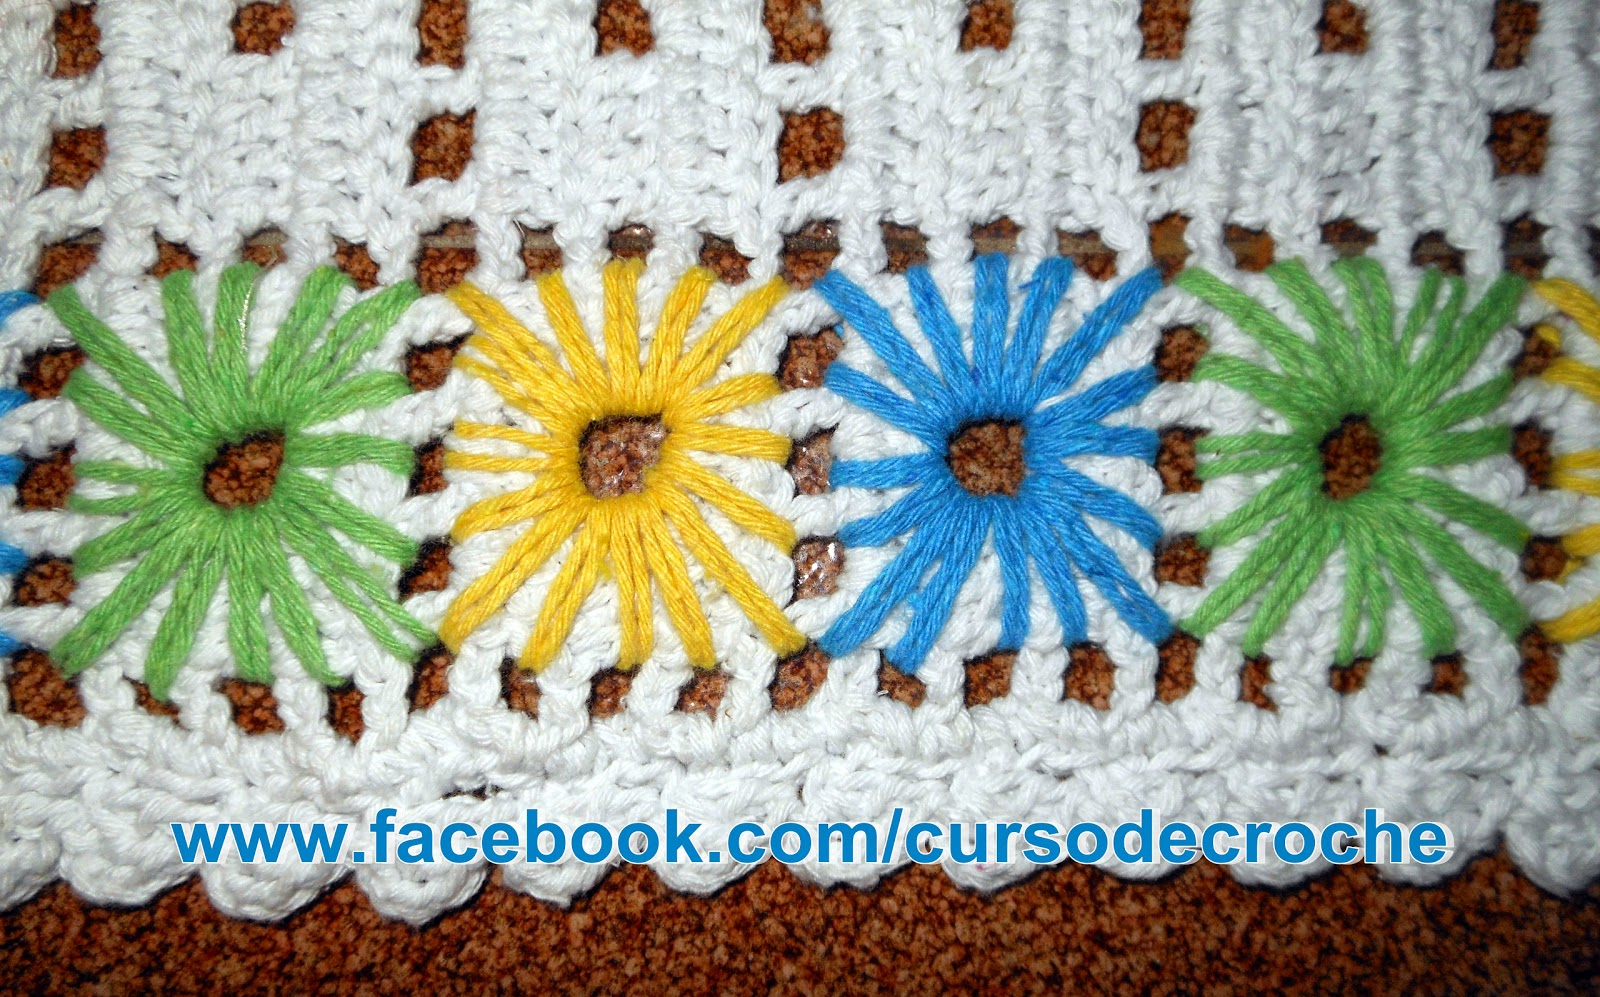 aprender croche bordado técnica ponto ilhós dvd curso de croche frete gratis loja edinir-croche